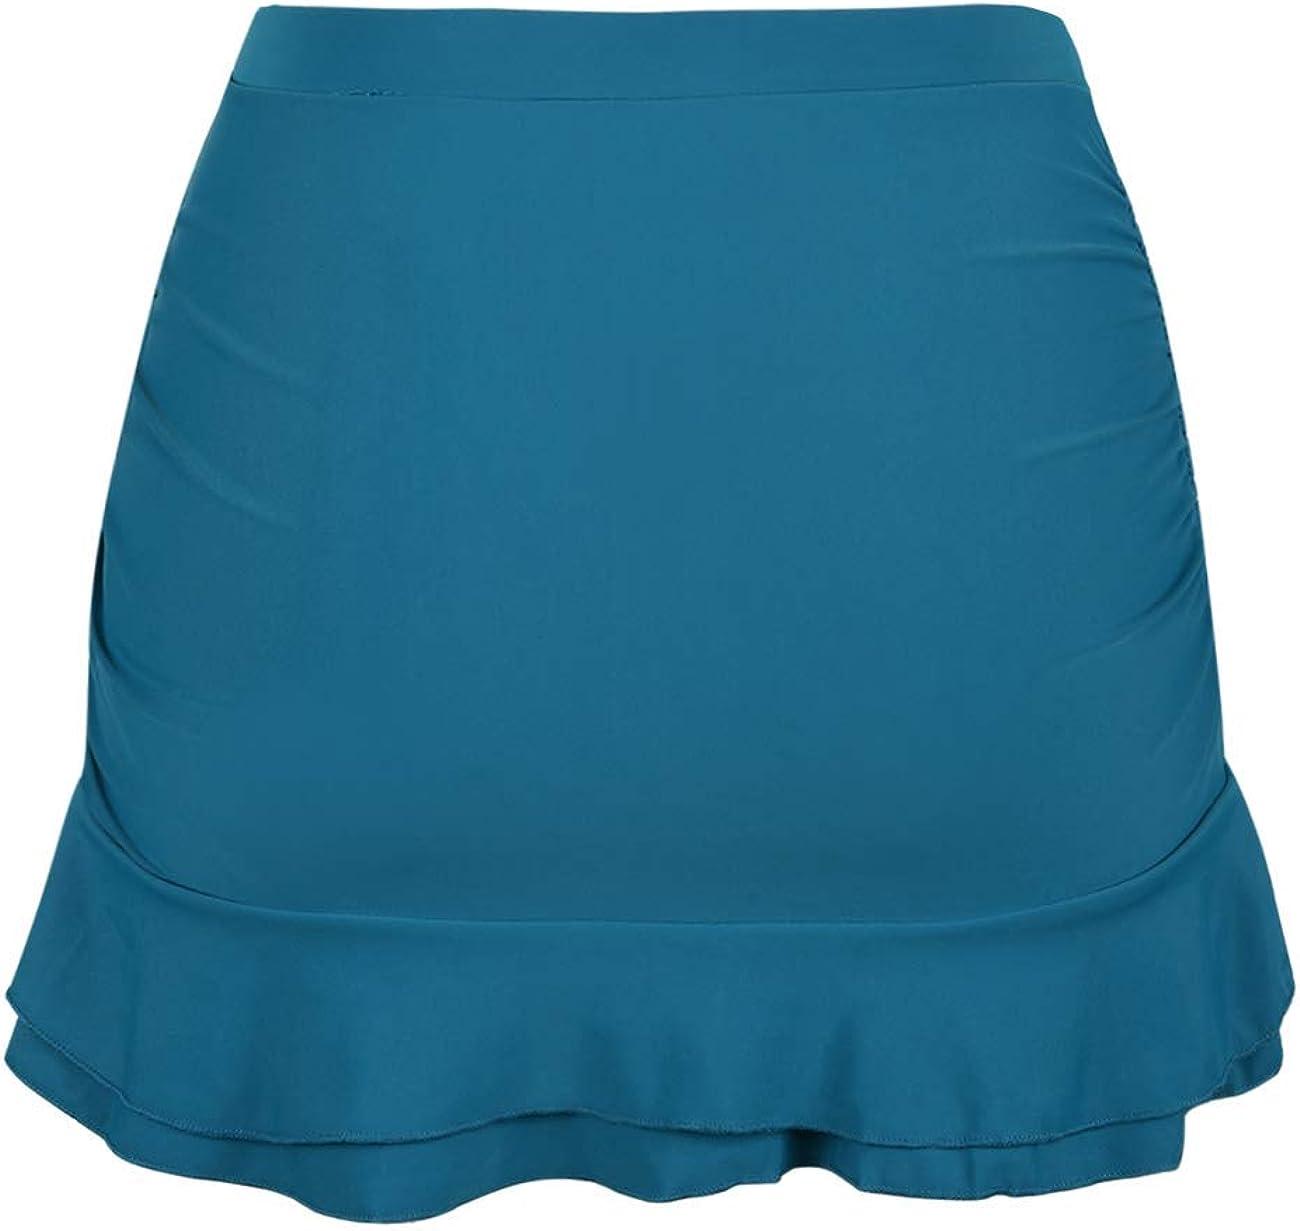 Hilor Womens Skirted Bikini Bottom High Waisted Shirred Swim Bottom Ruffle Swim Skirt